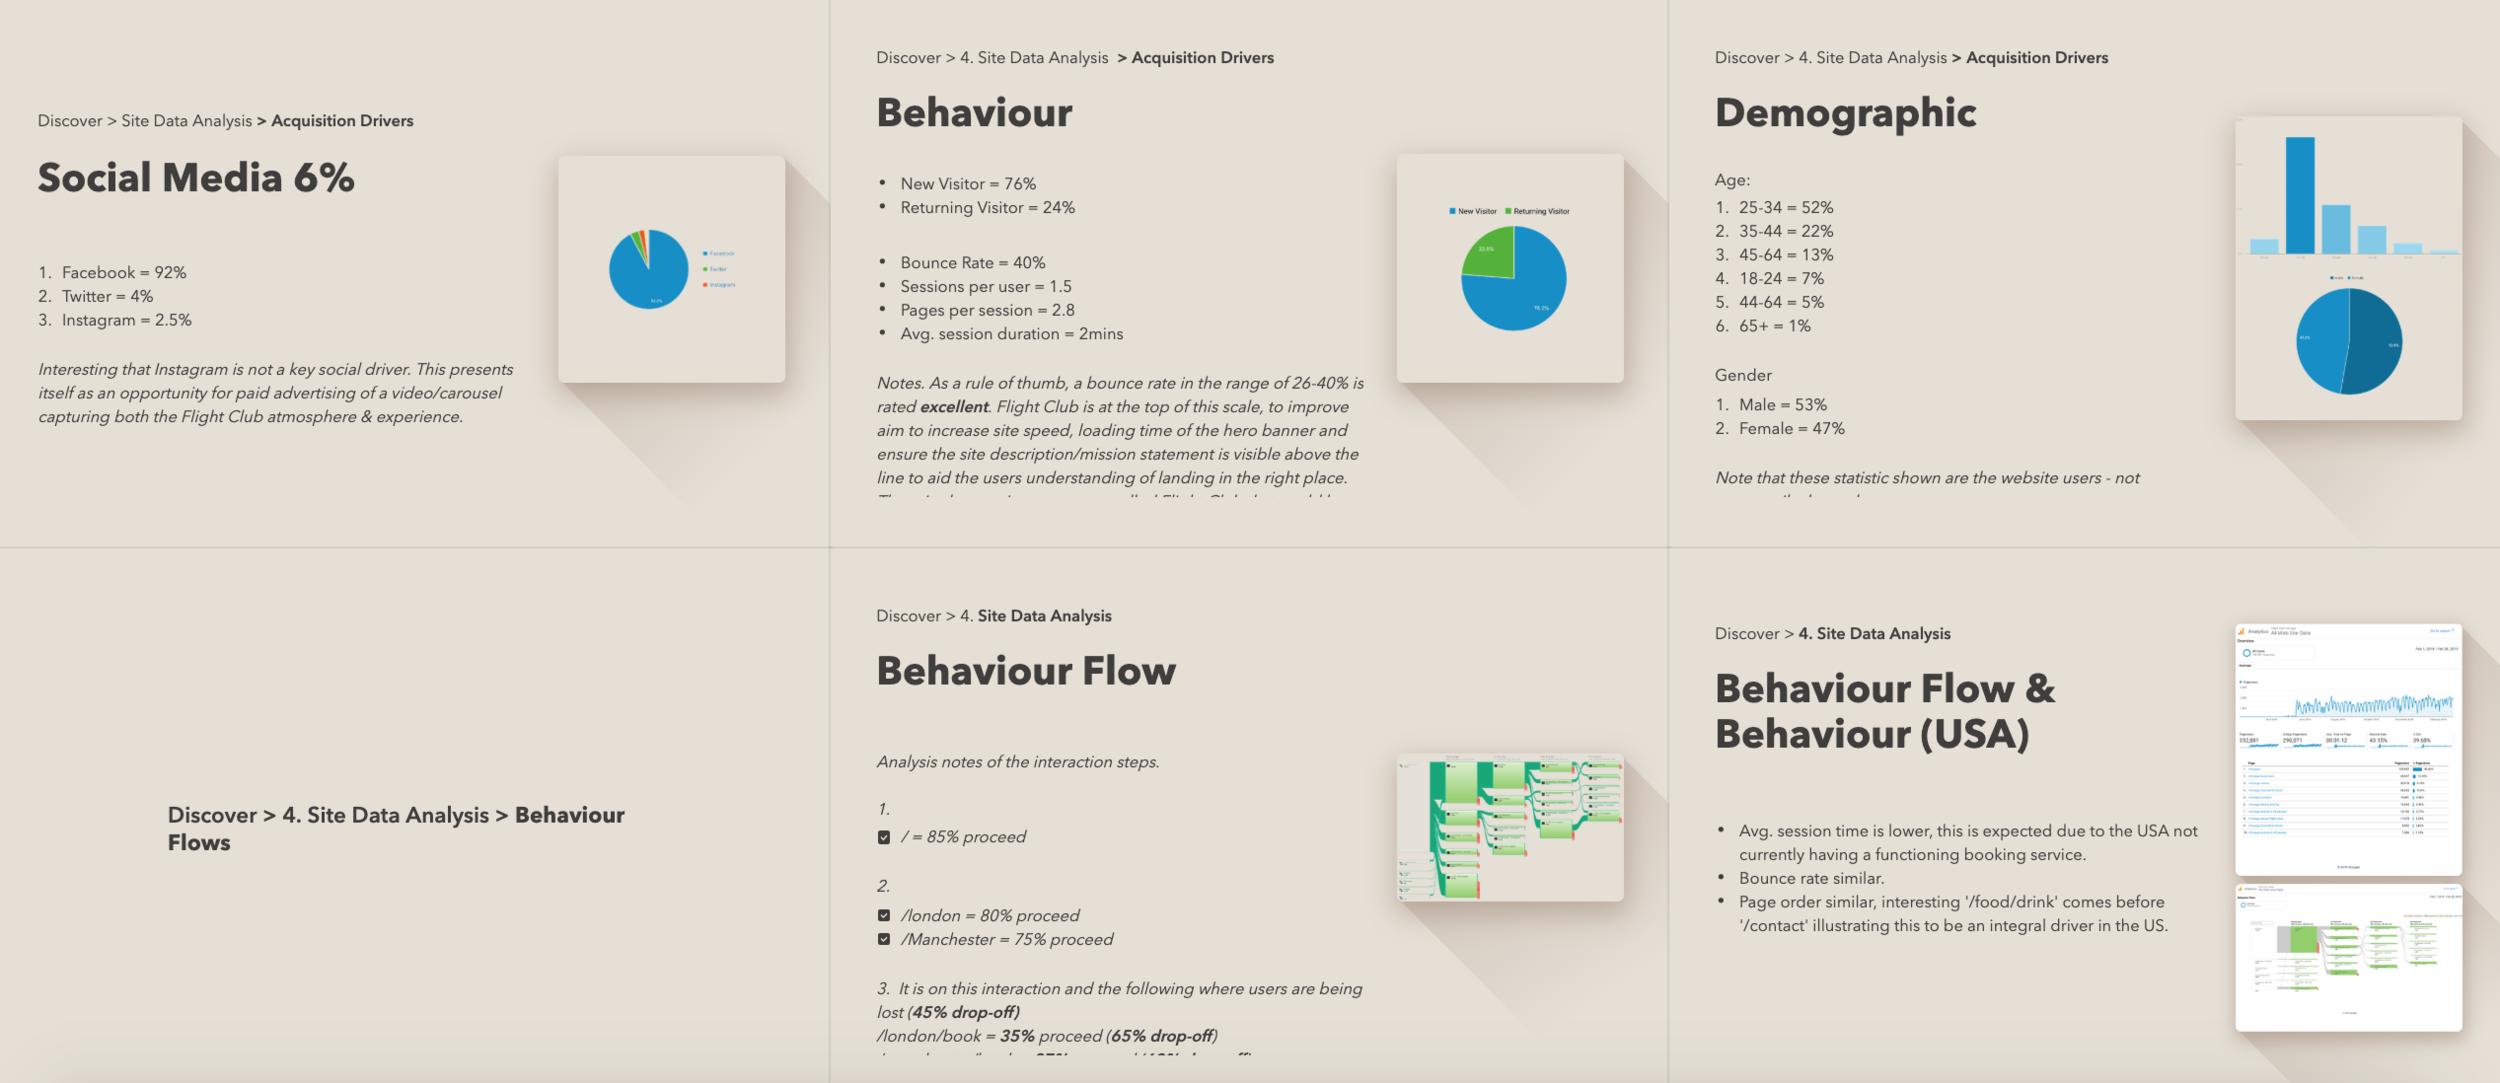 laurengracedesign-freelance-ux-designer-consultant-flight-club-darts-site-data-analysis-acquisition.png